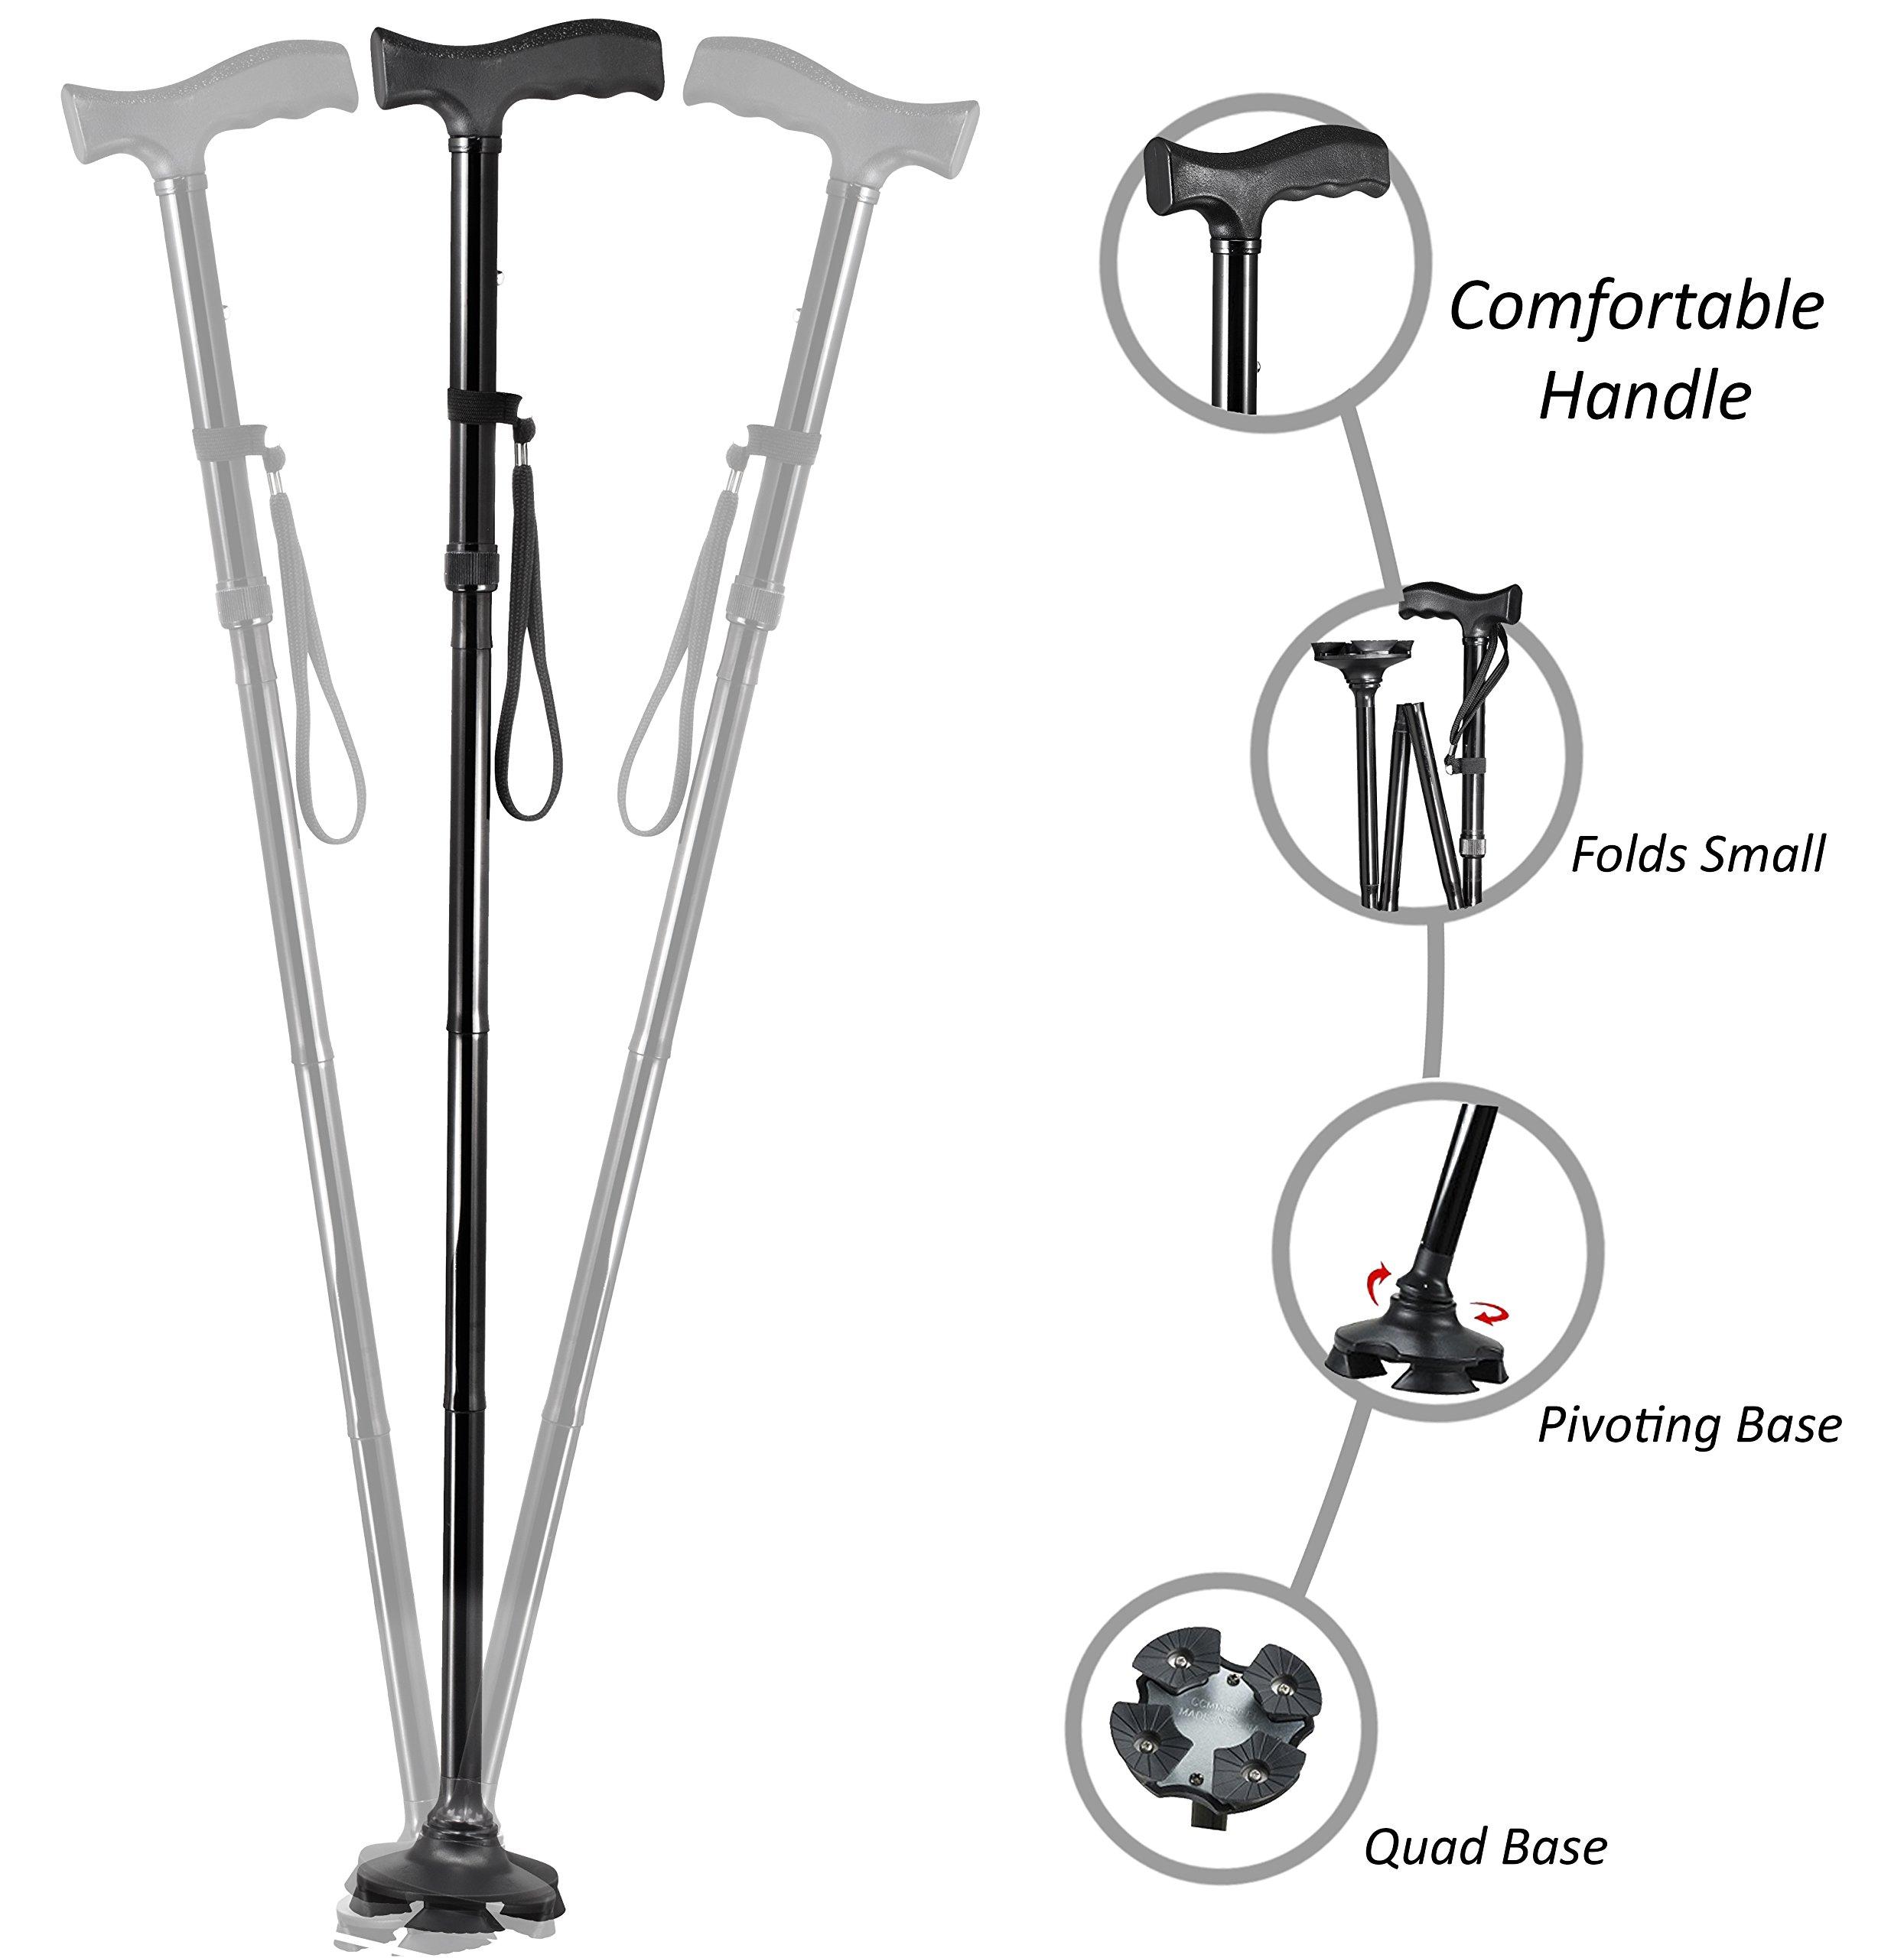 Medi-Cane Folding Travel Cane with Pivoting Wide Quad Foot Base Adjustable Hight Cane (Medium)